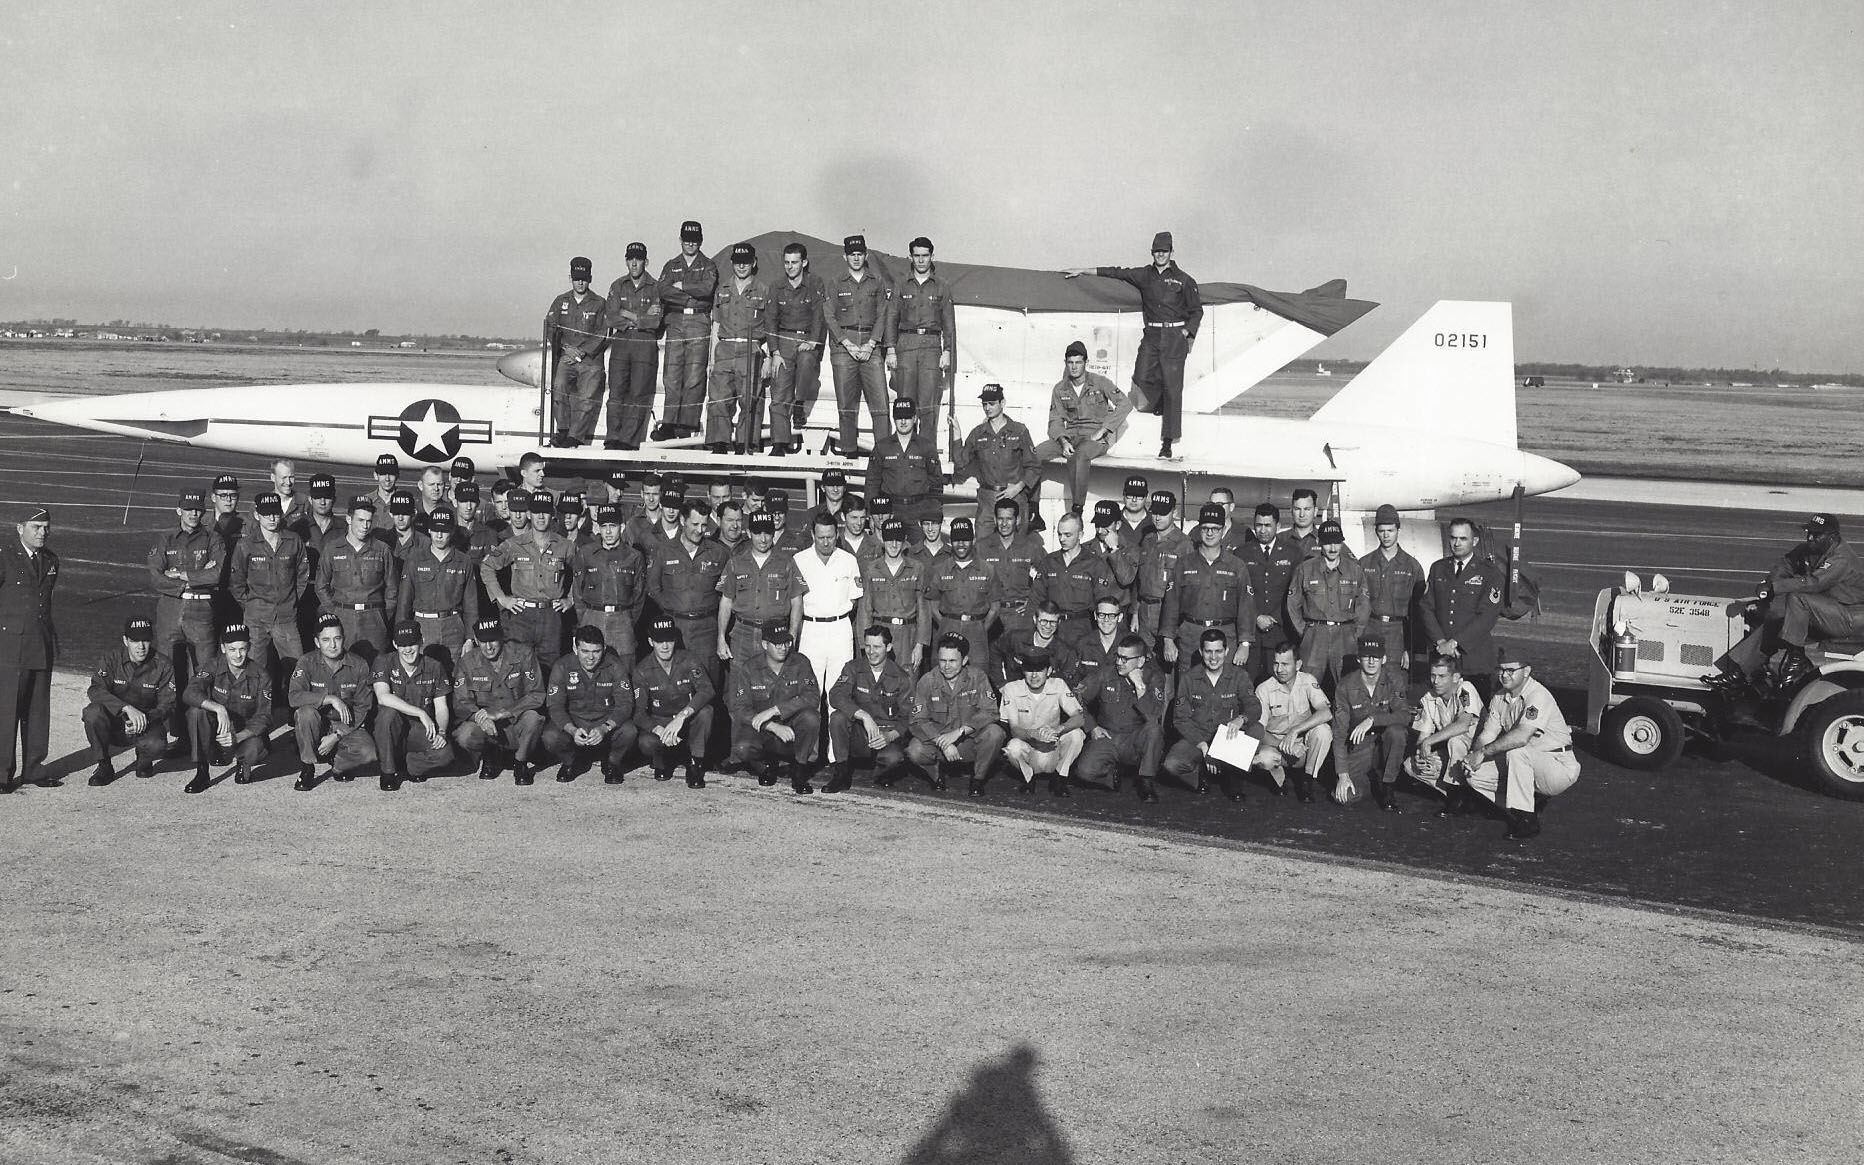 390th_AMMS_Troops_-_Bergstrom_AFB_-_1965 crop.jpg